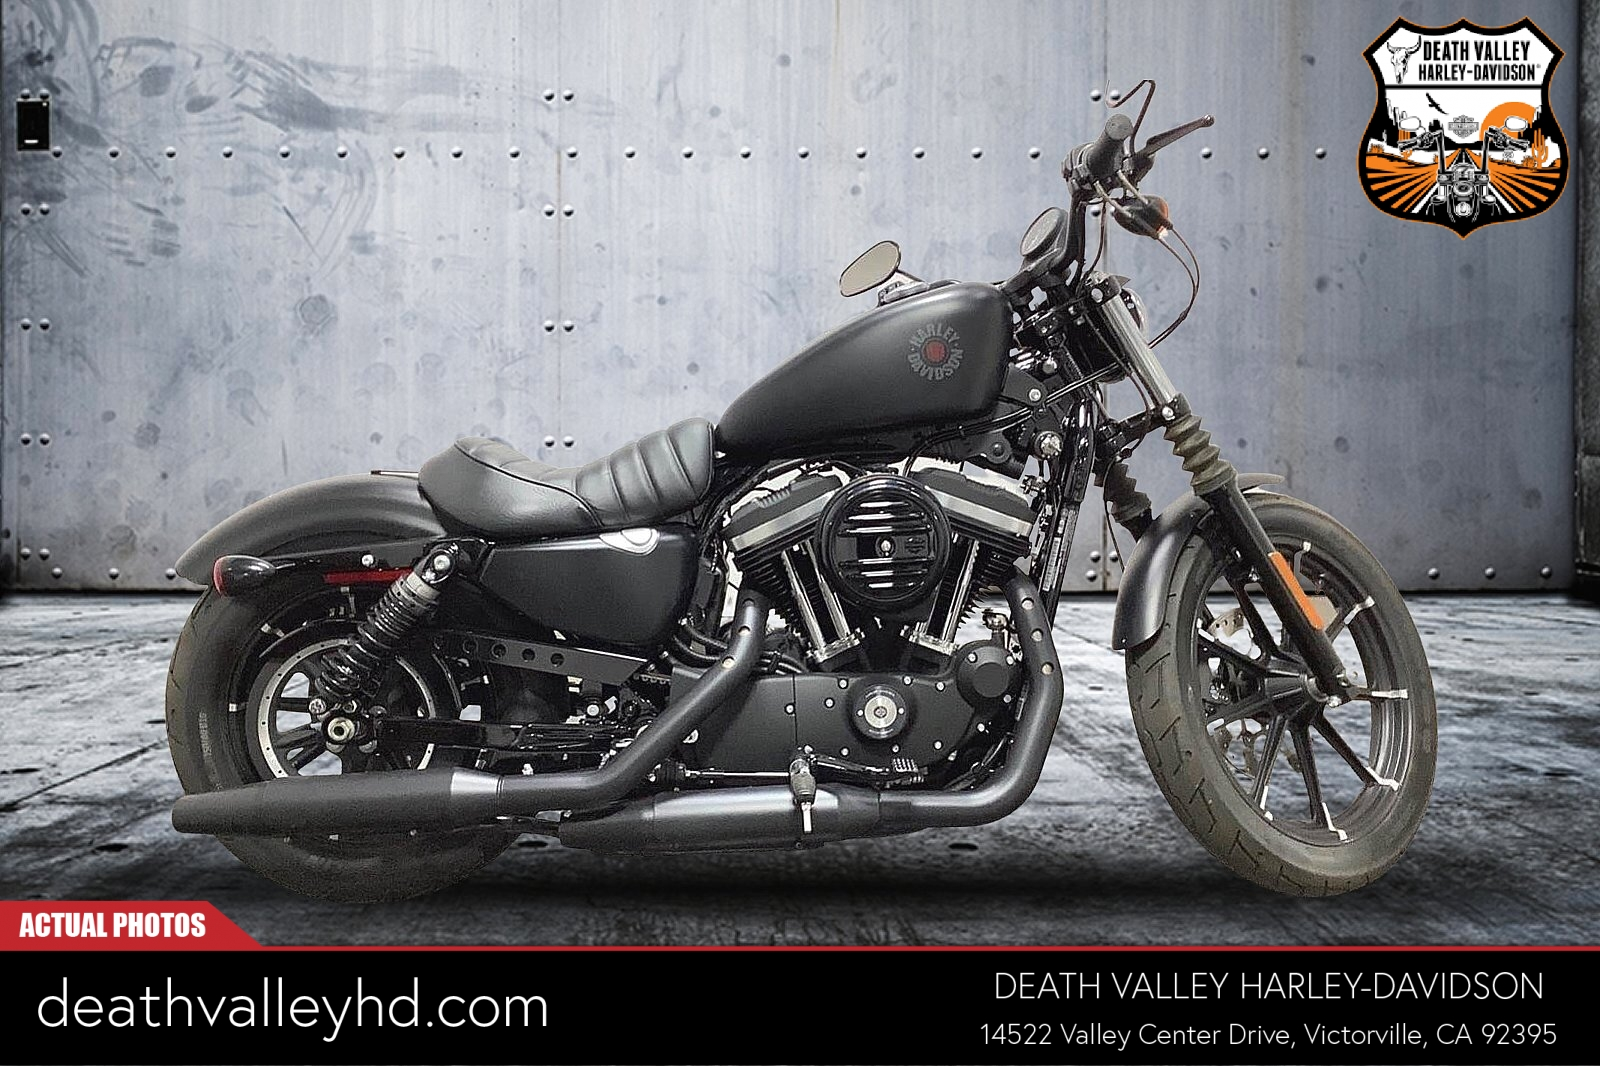 2020 Harley-Davidson Iron 883 [0]